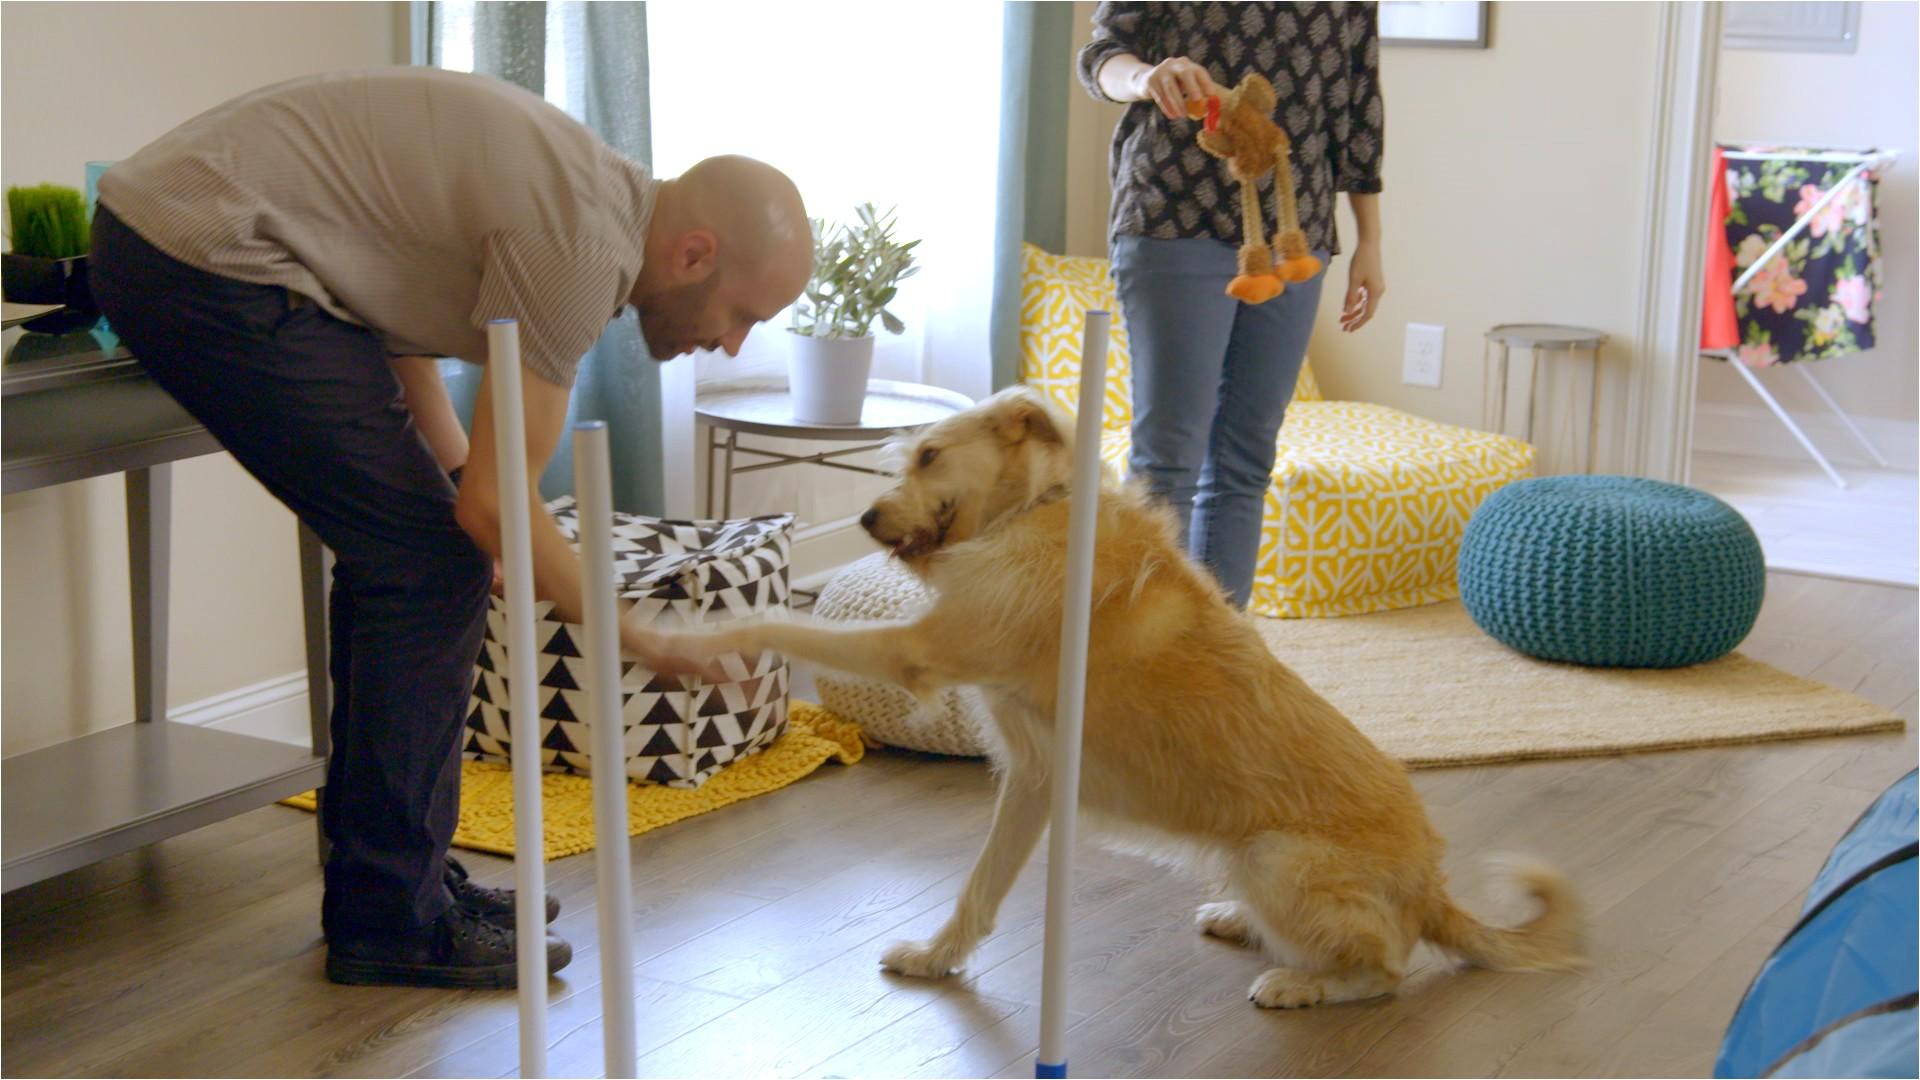 Pergo Flooring Good for Dogs Pergo Flooring for Dogs 28 Images Floor Pergo Floors